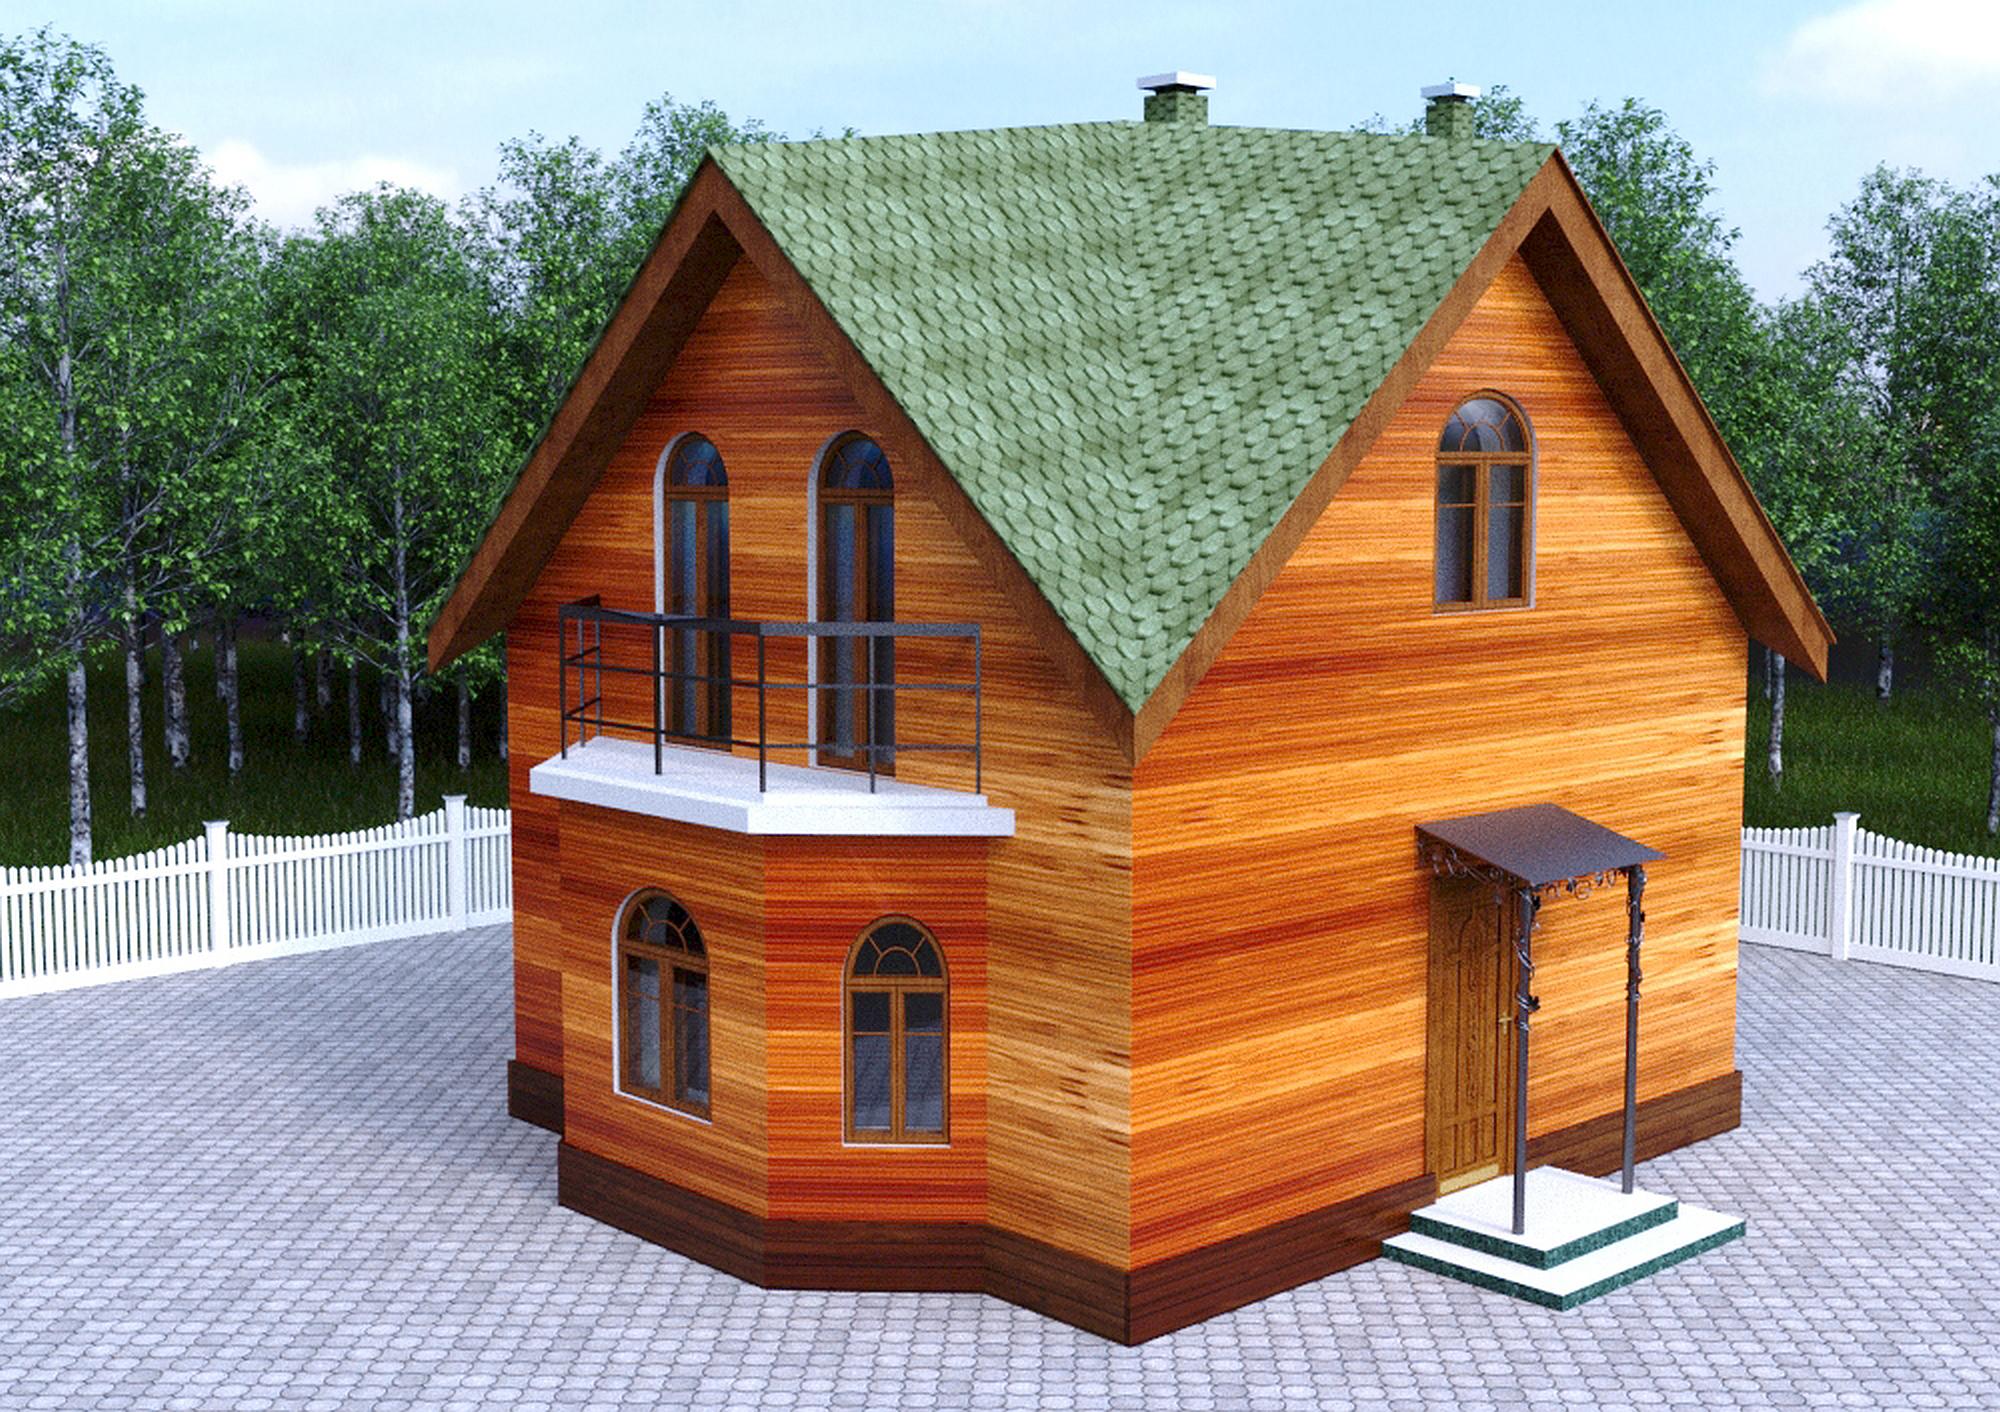 Проект гостевого дома с баней 64 кв.м / Арт. Cу-71 фасад